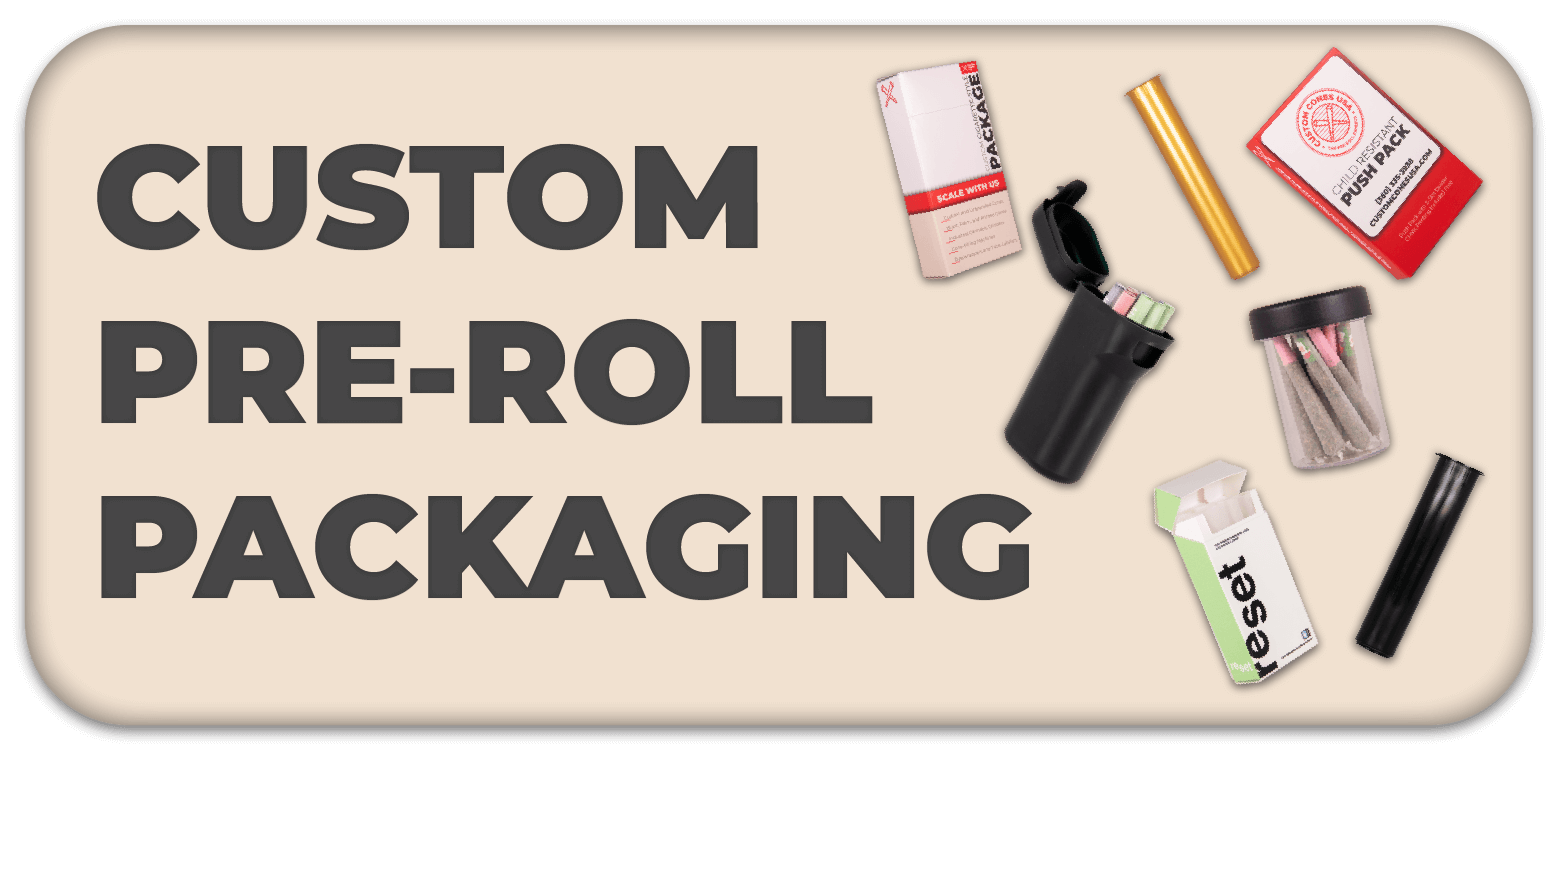 Custom Pre-Roll Packaging Button